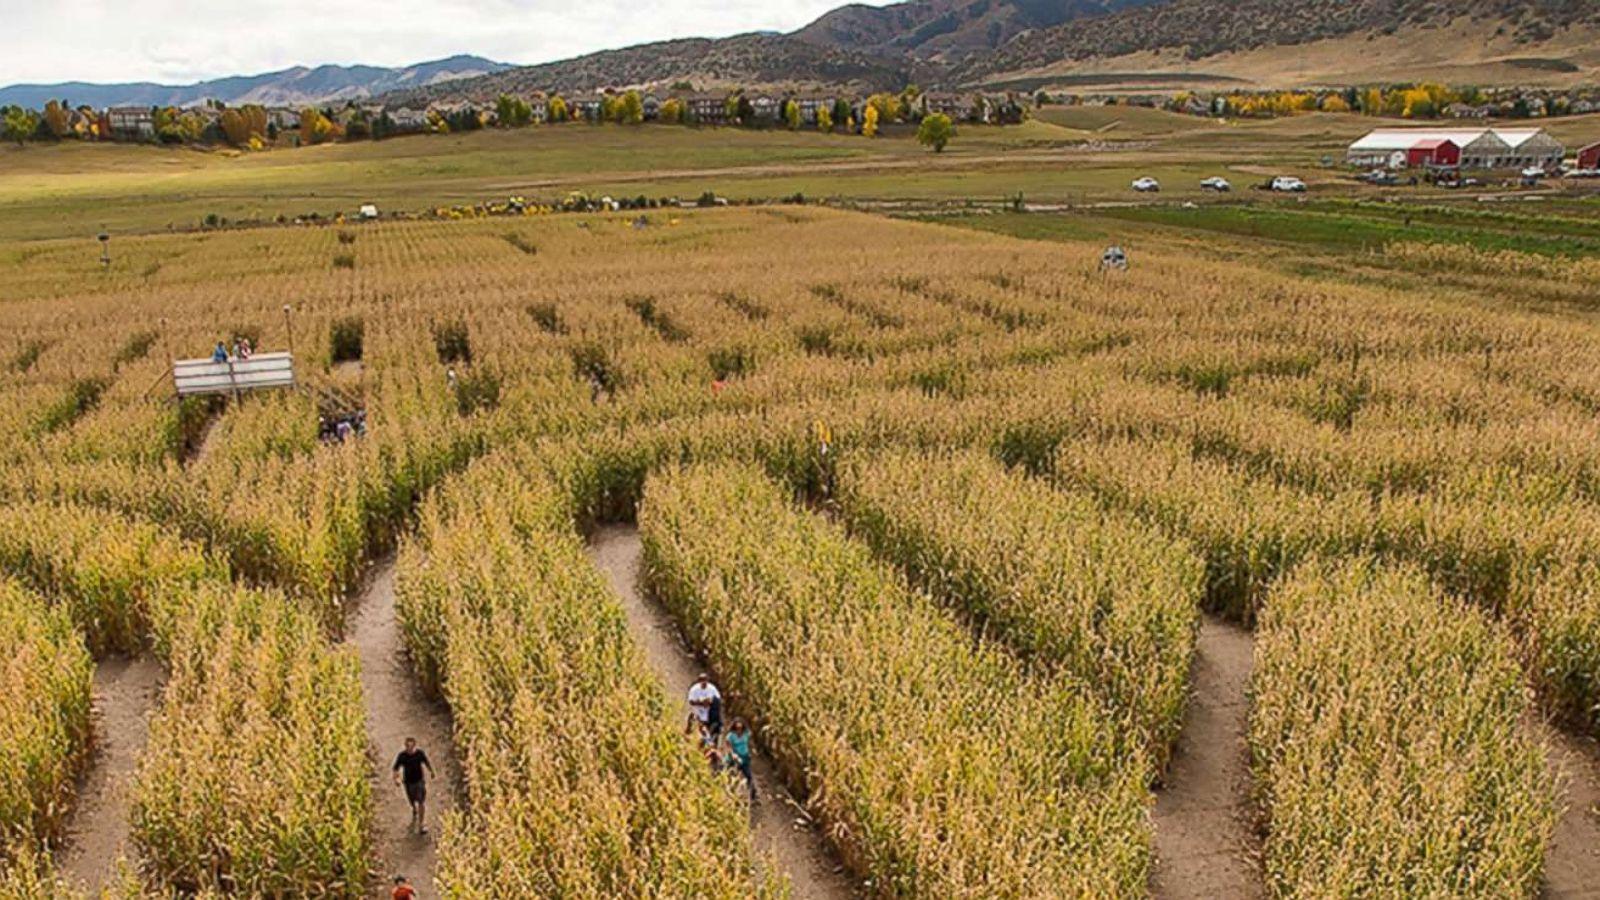 Masked man attacks woman inside Denver corn maze - ABC News